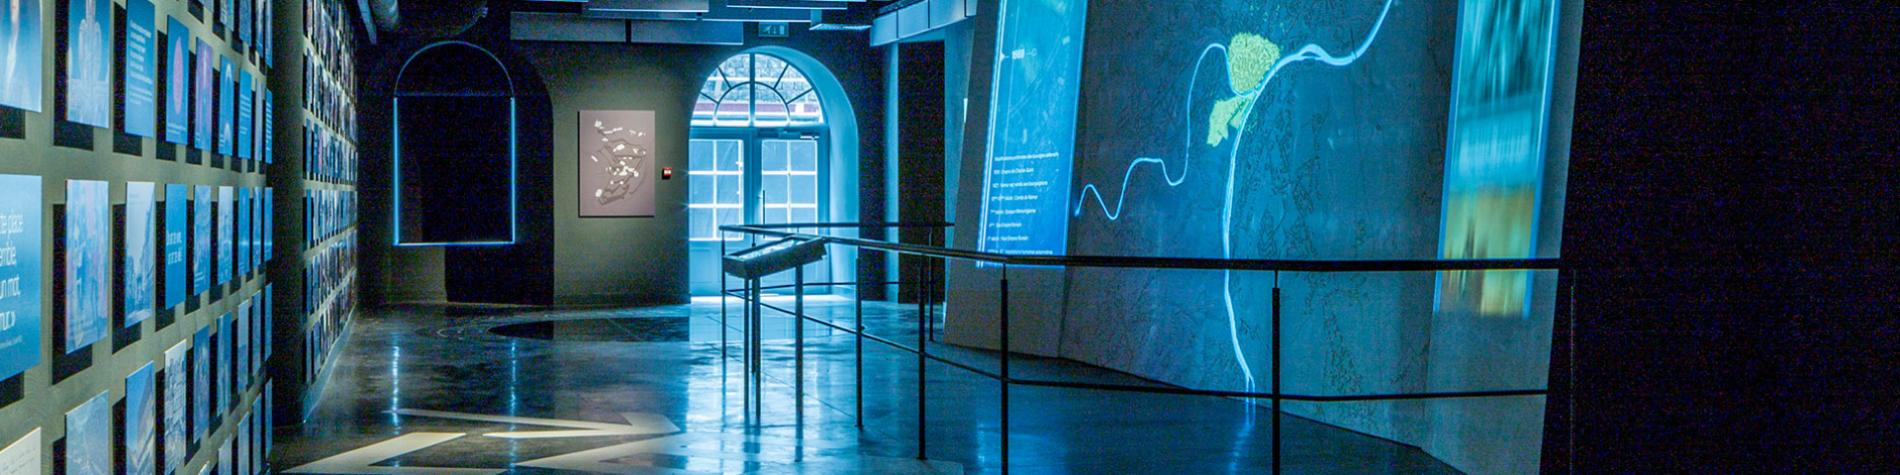 Citadel - Namen - museum - TerraNova - Architectuur - Buitengewoon Wallonië